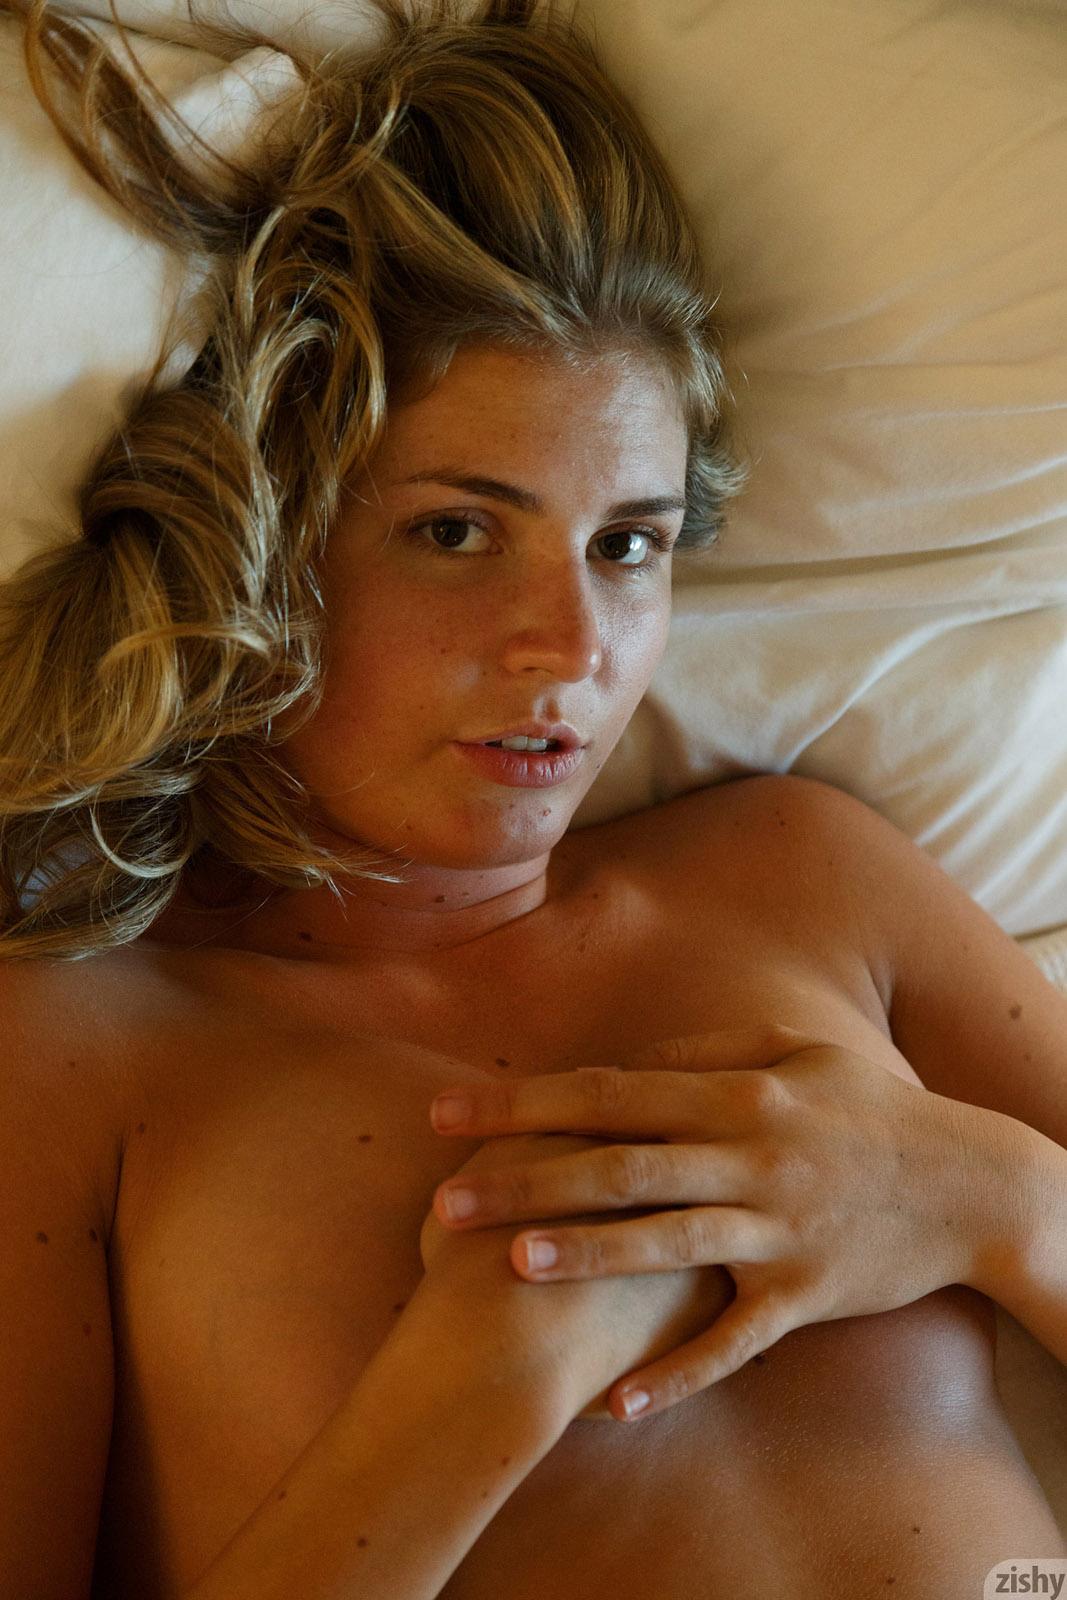 Presley Callen No Thong Zishy nude pics - Bunnylust.com